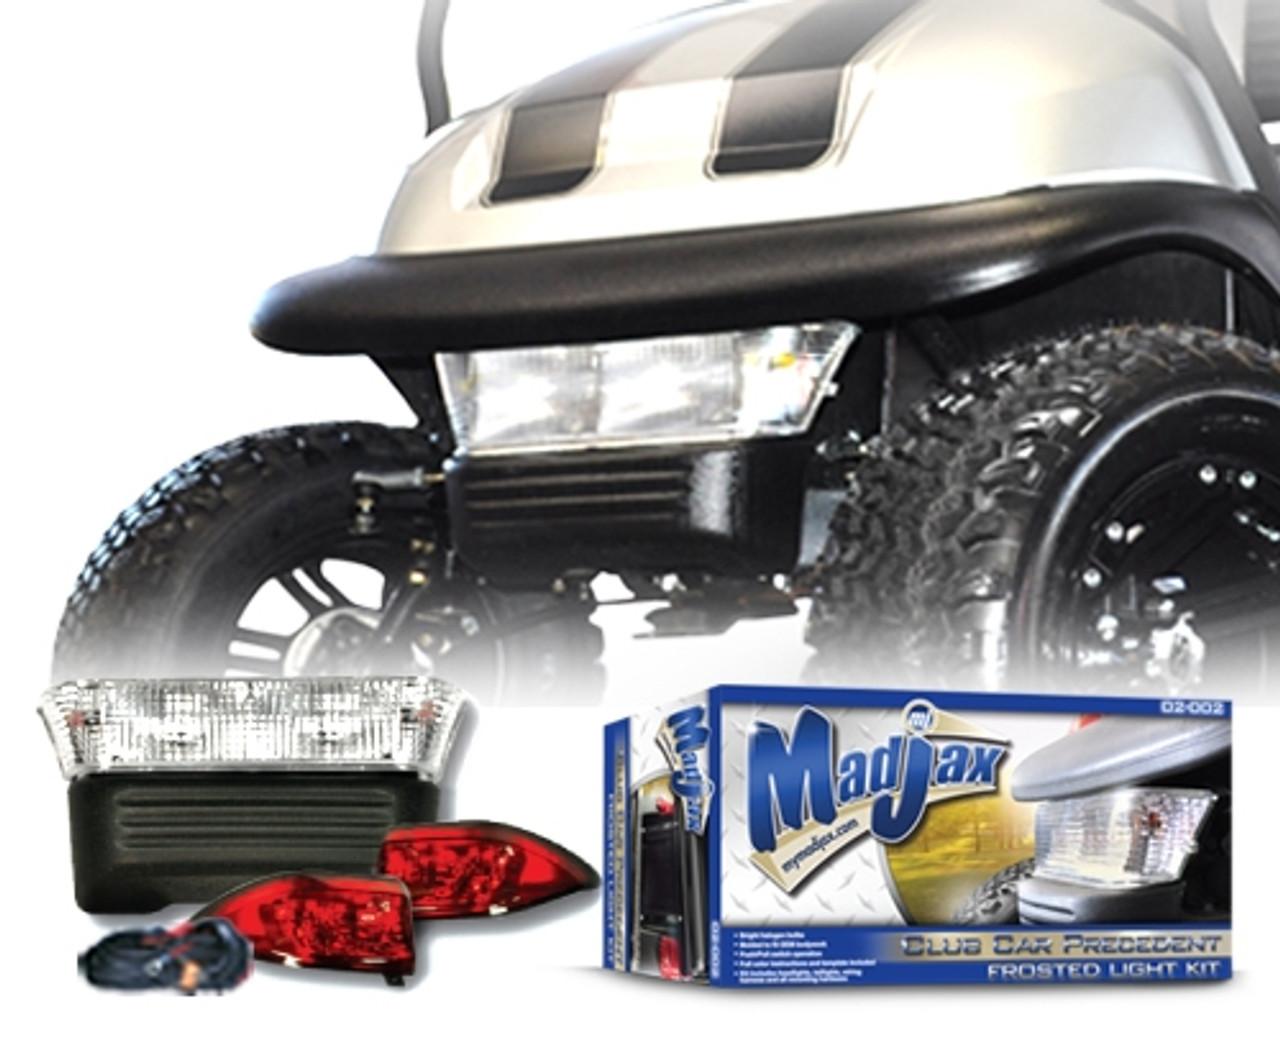 Madjax Club Car Precedent Light Kit Frosted Lens Golf